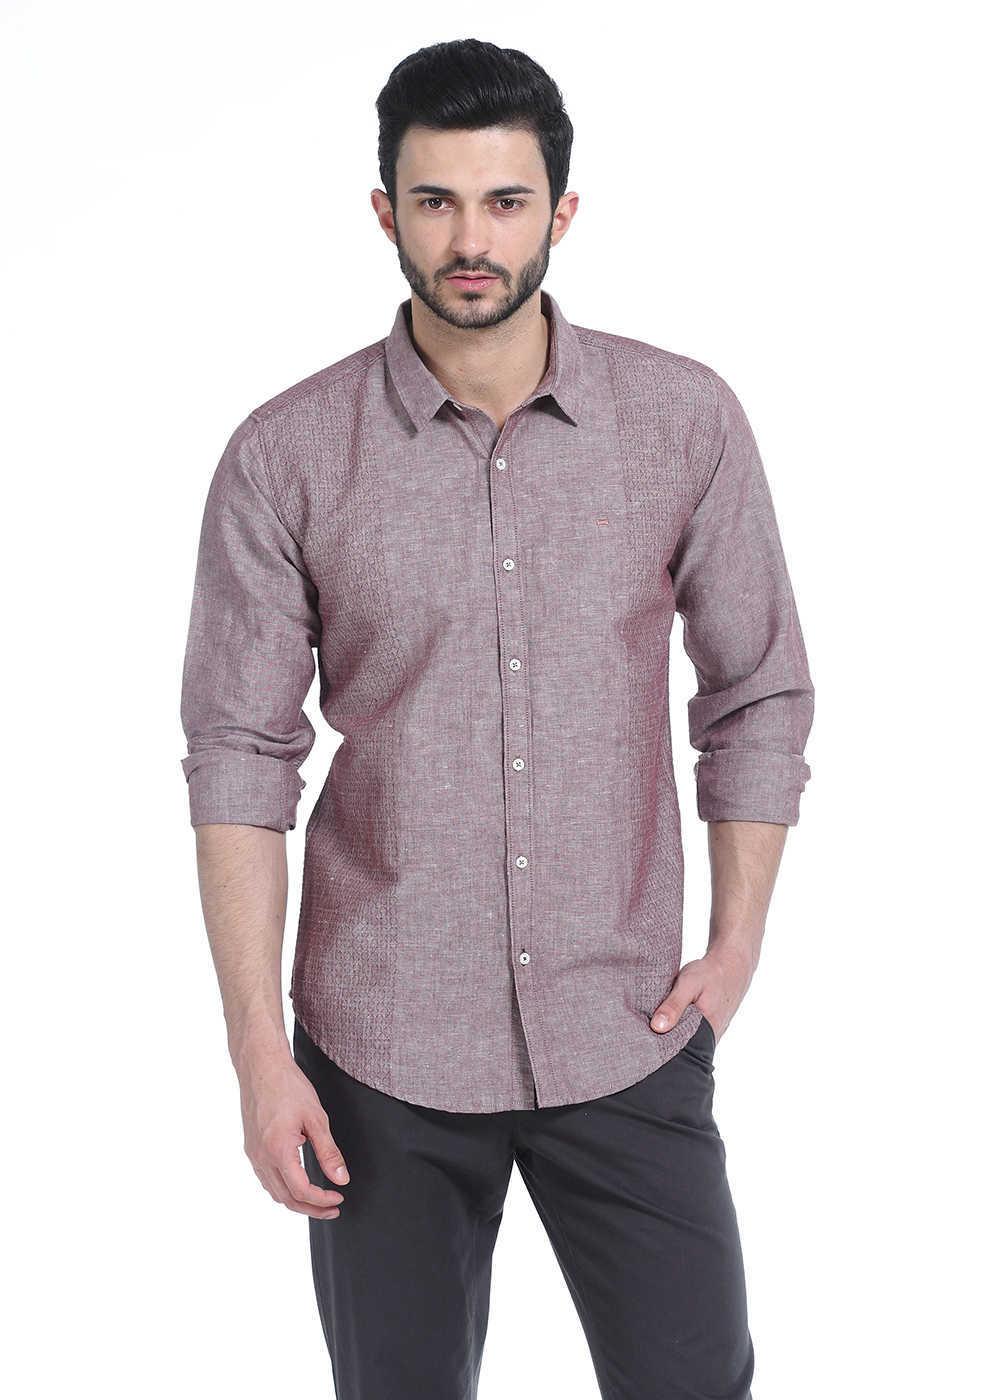 Basics | Basics Slim Fit Red Taupe Chambray Combination Shirt